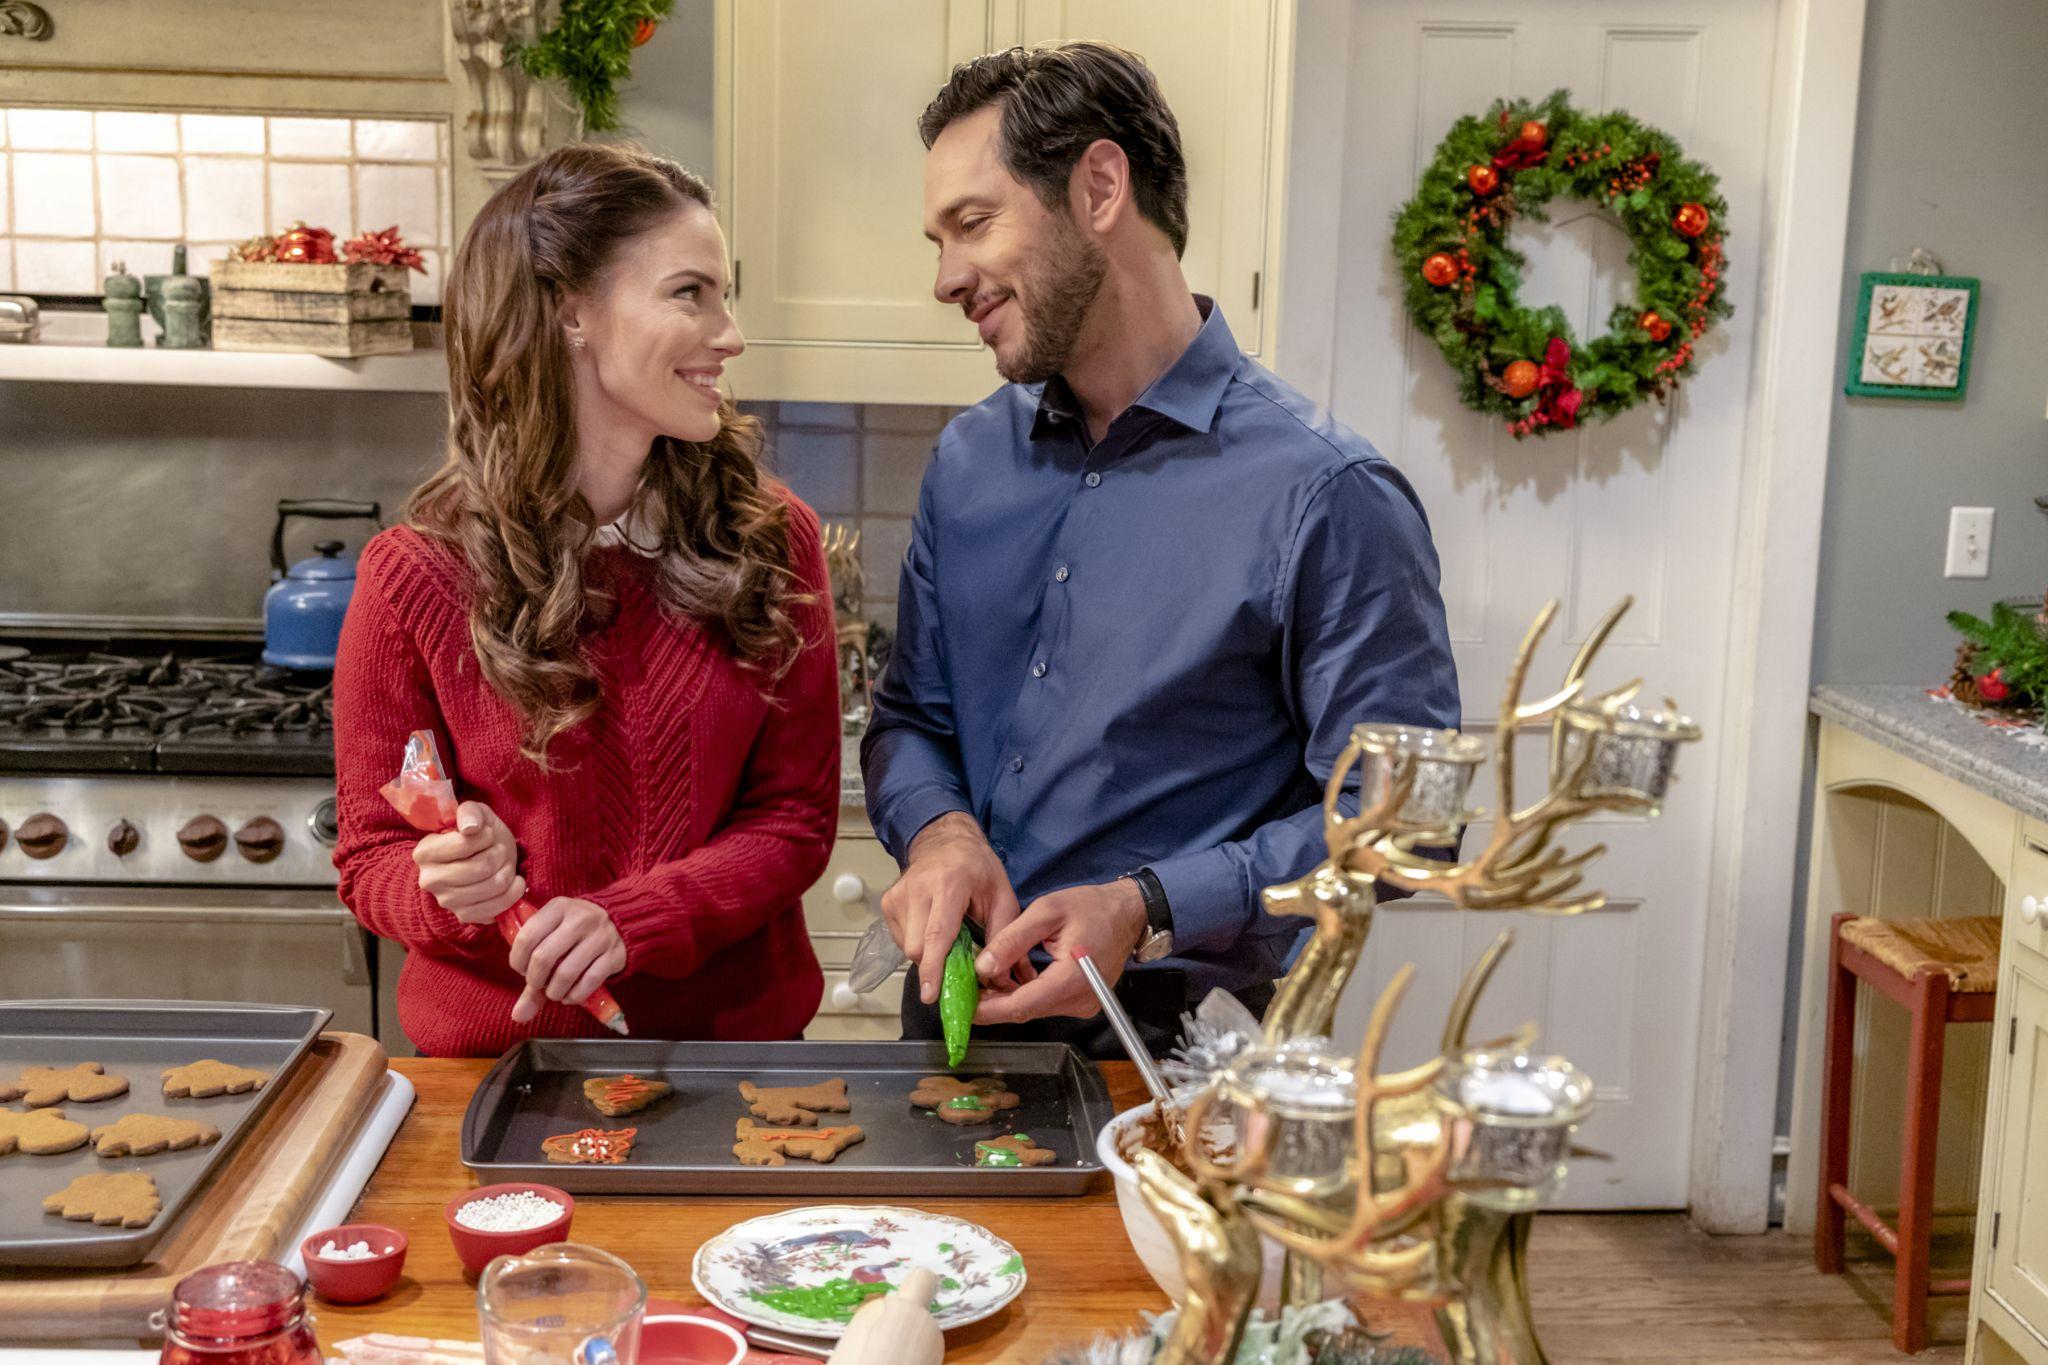 Hallmark holiday movies filmed in Connecticut